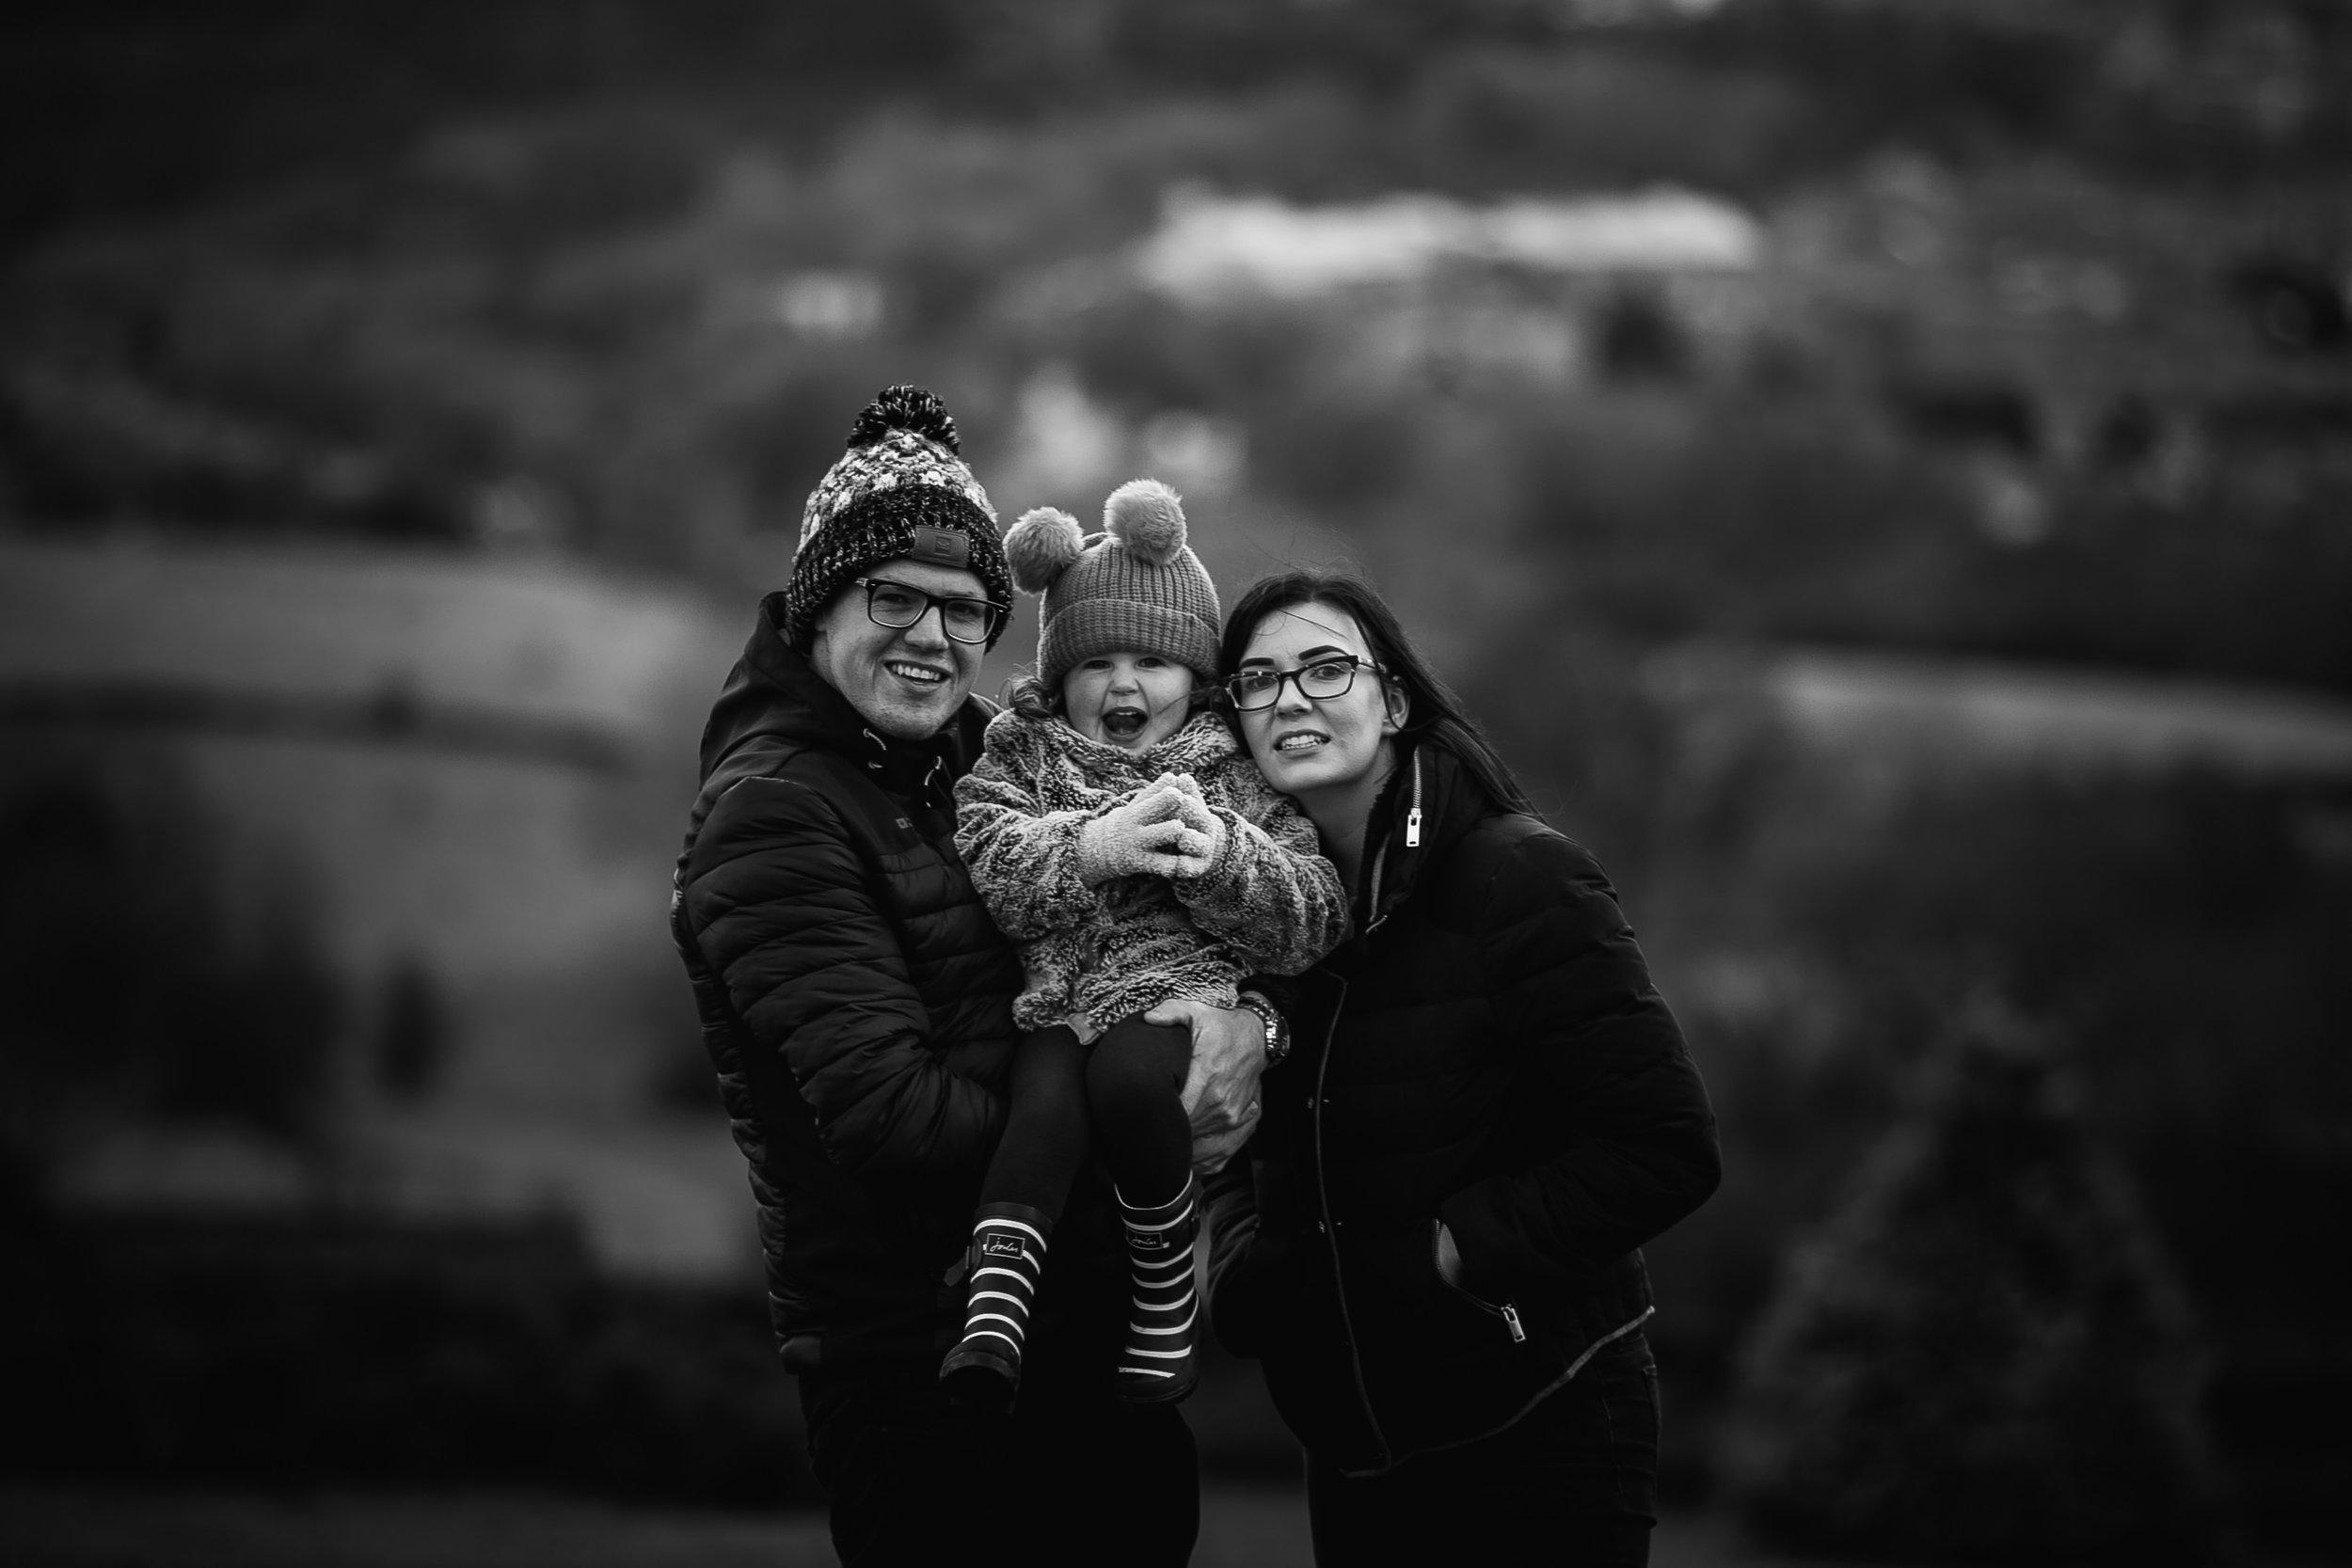 09_12_18_James Family Photoshoot-72.JPG